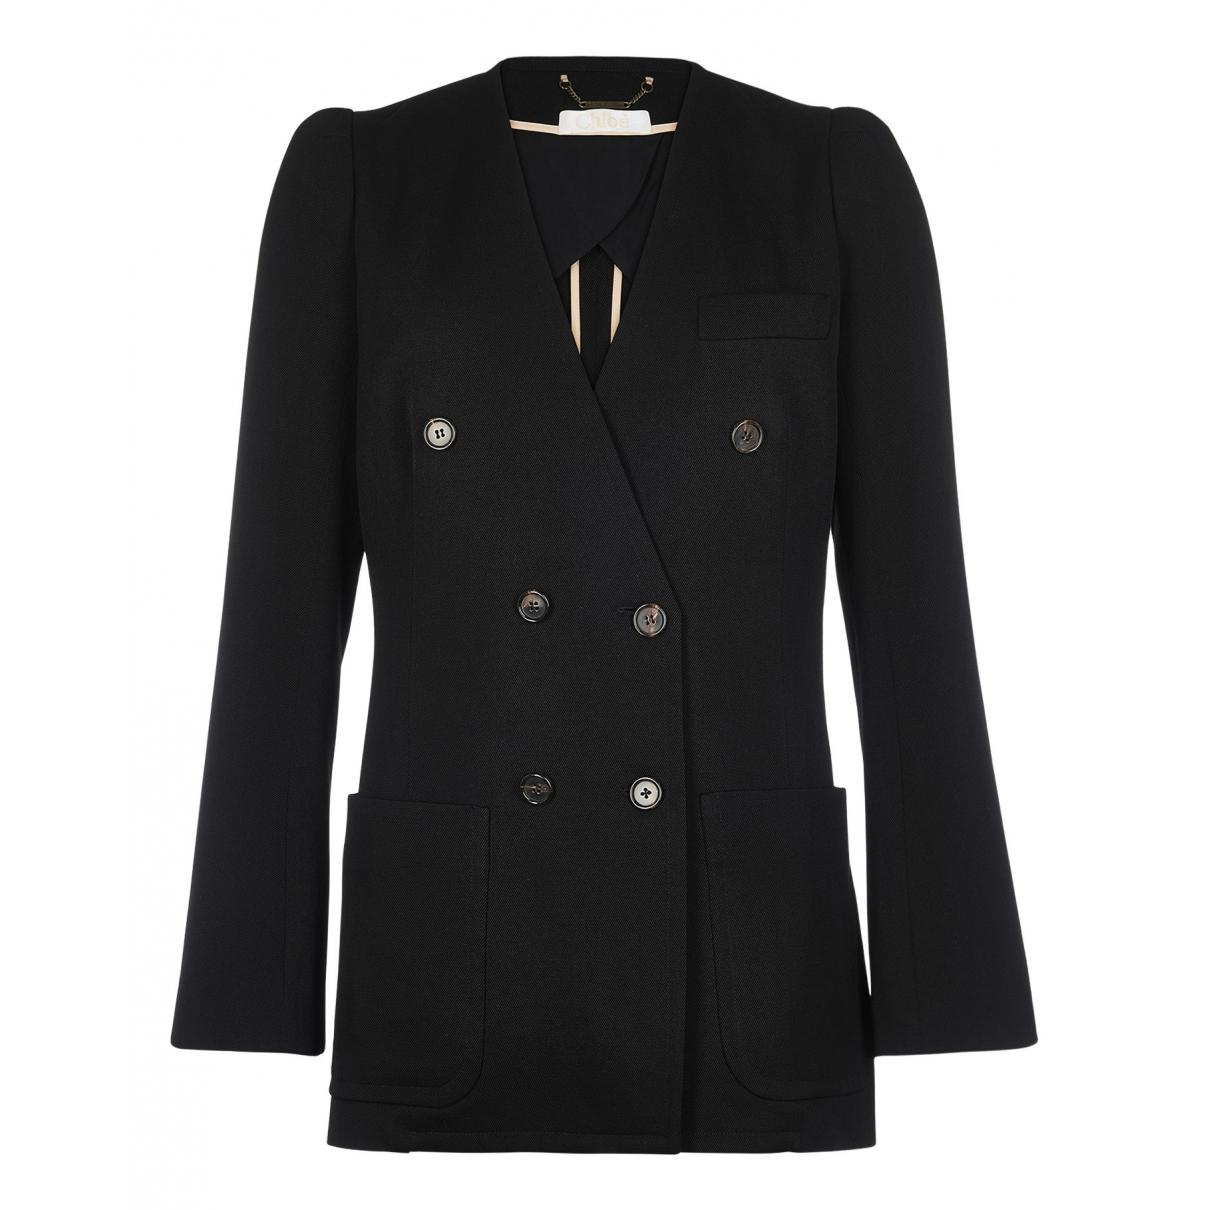 Chloé N Black Wool jacket for Women 12 UK